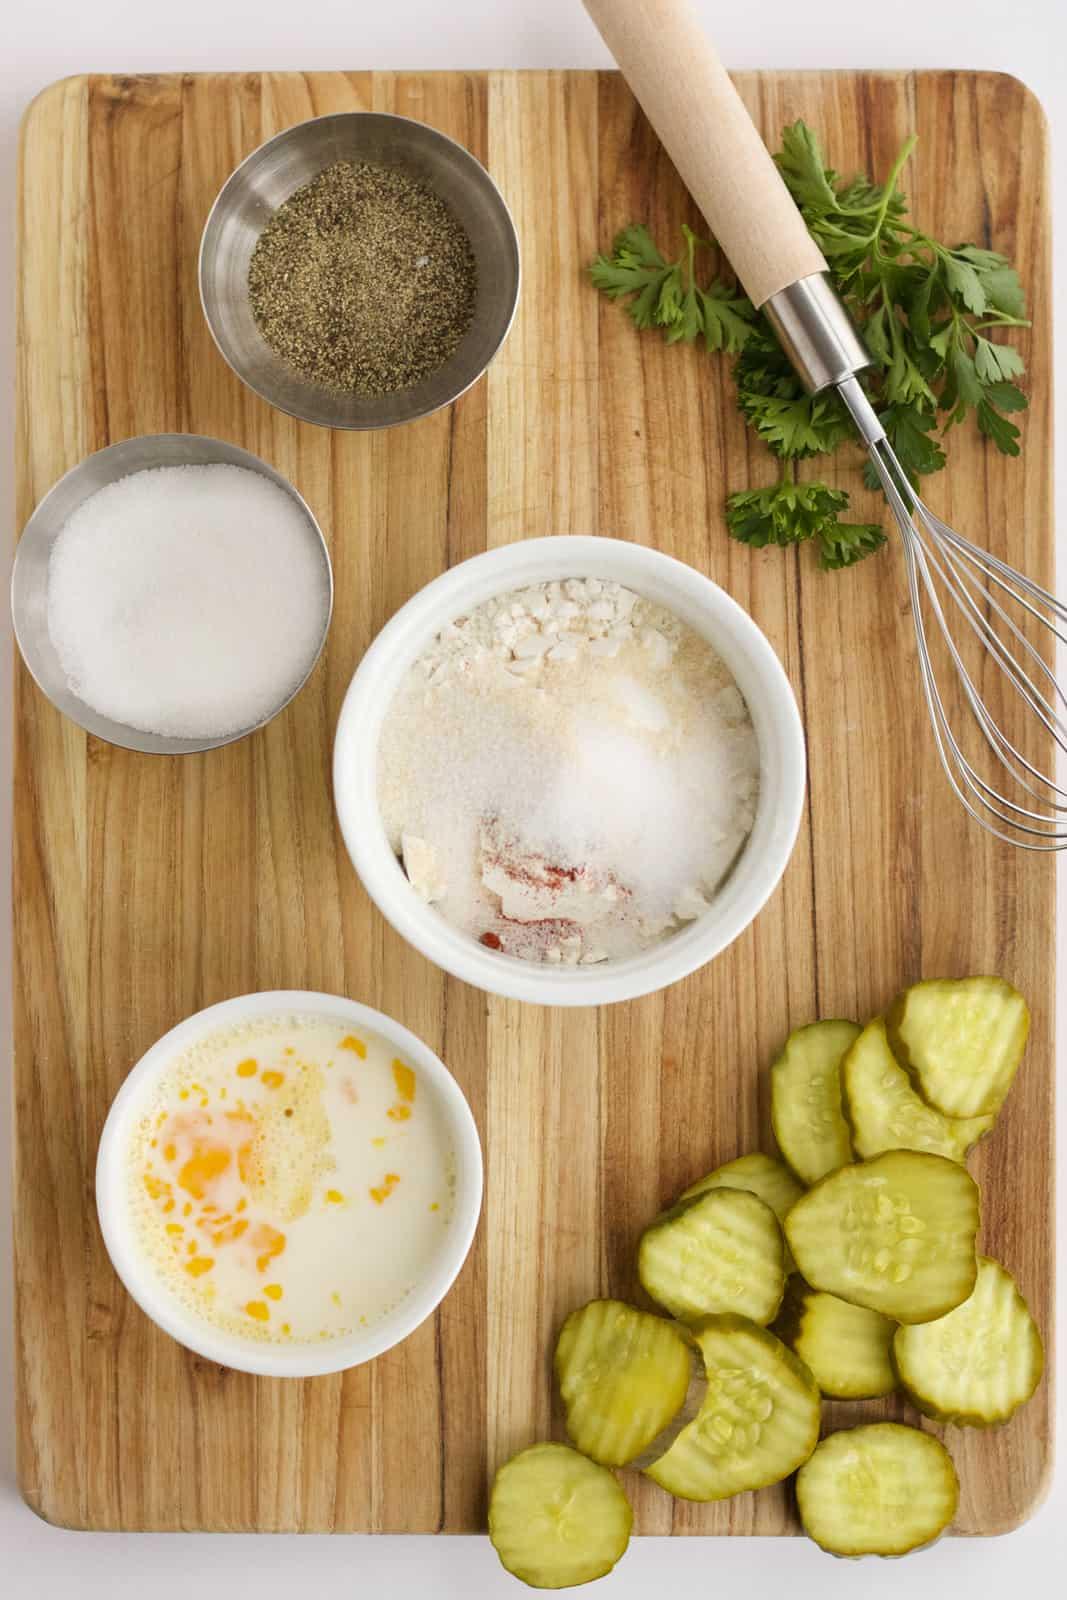 Ingredients needed to make Fried Pickles